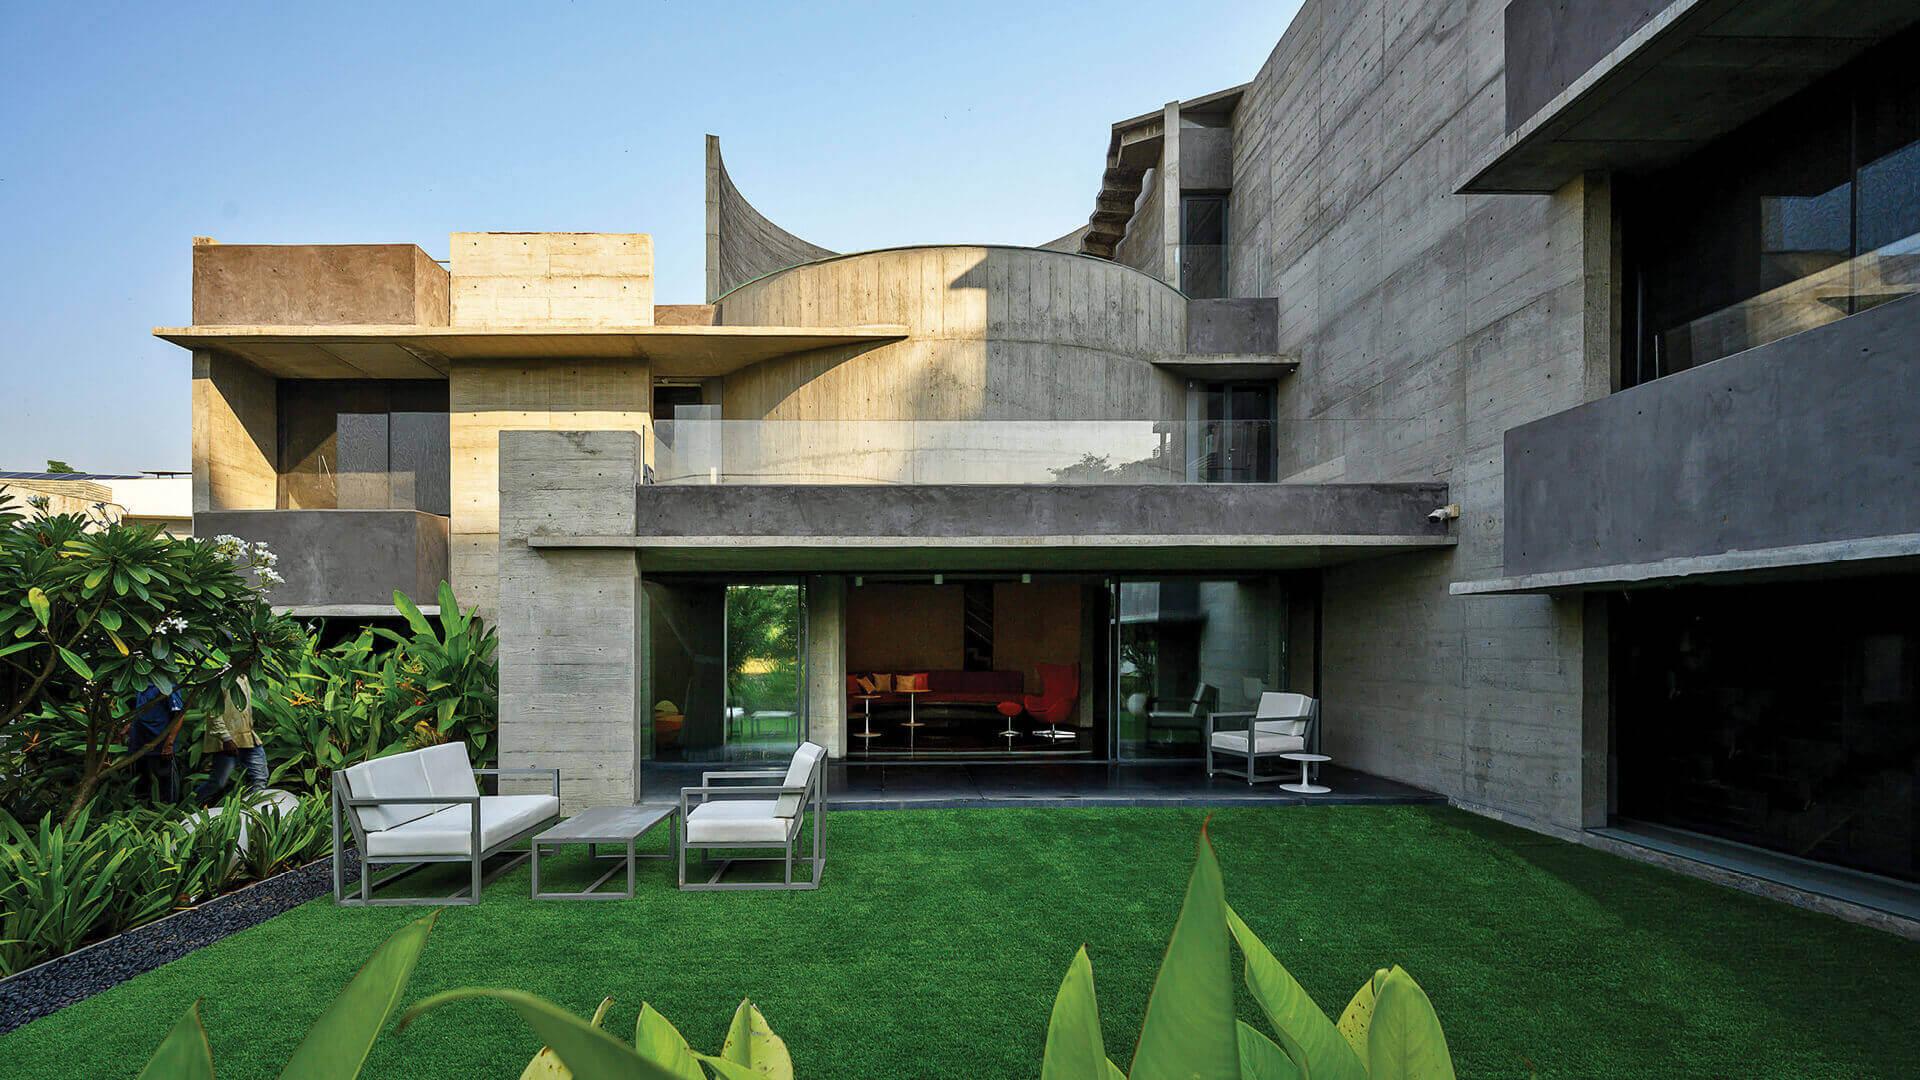 Matharoo Associates' Plain Ties House is a concrete edifice tied by a circular core